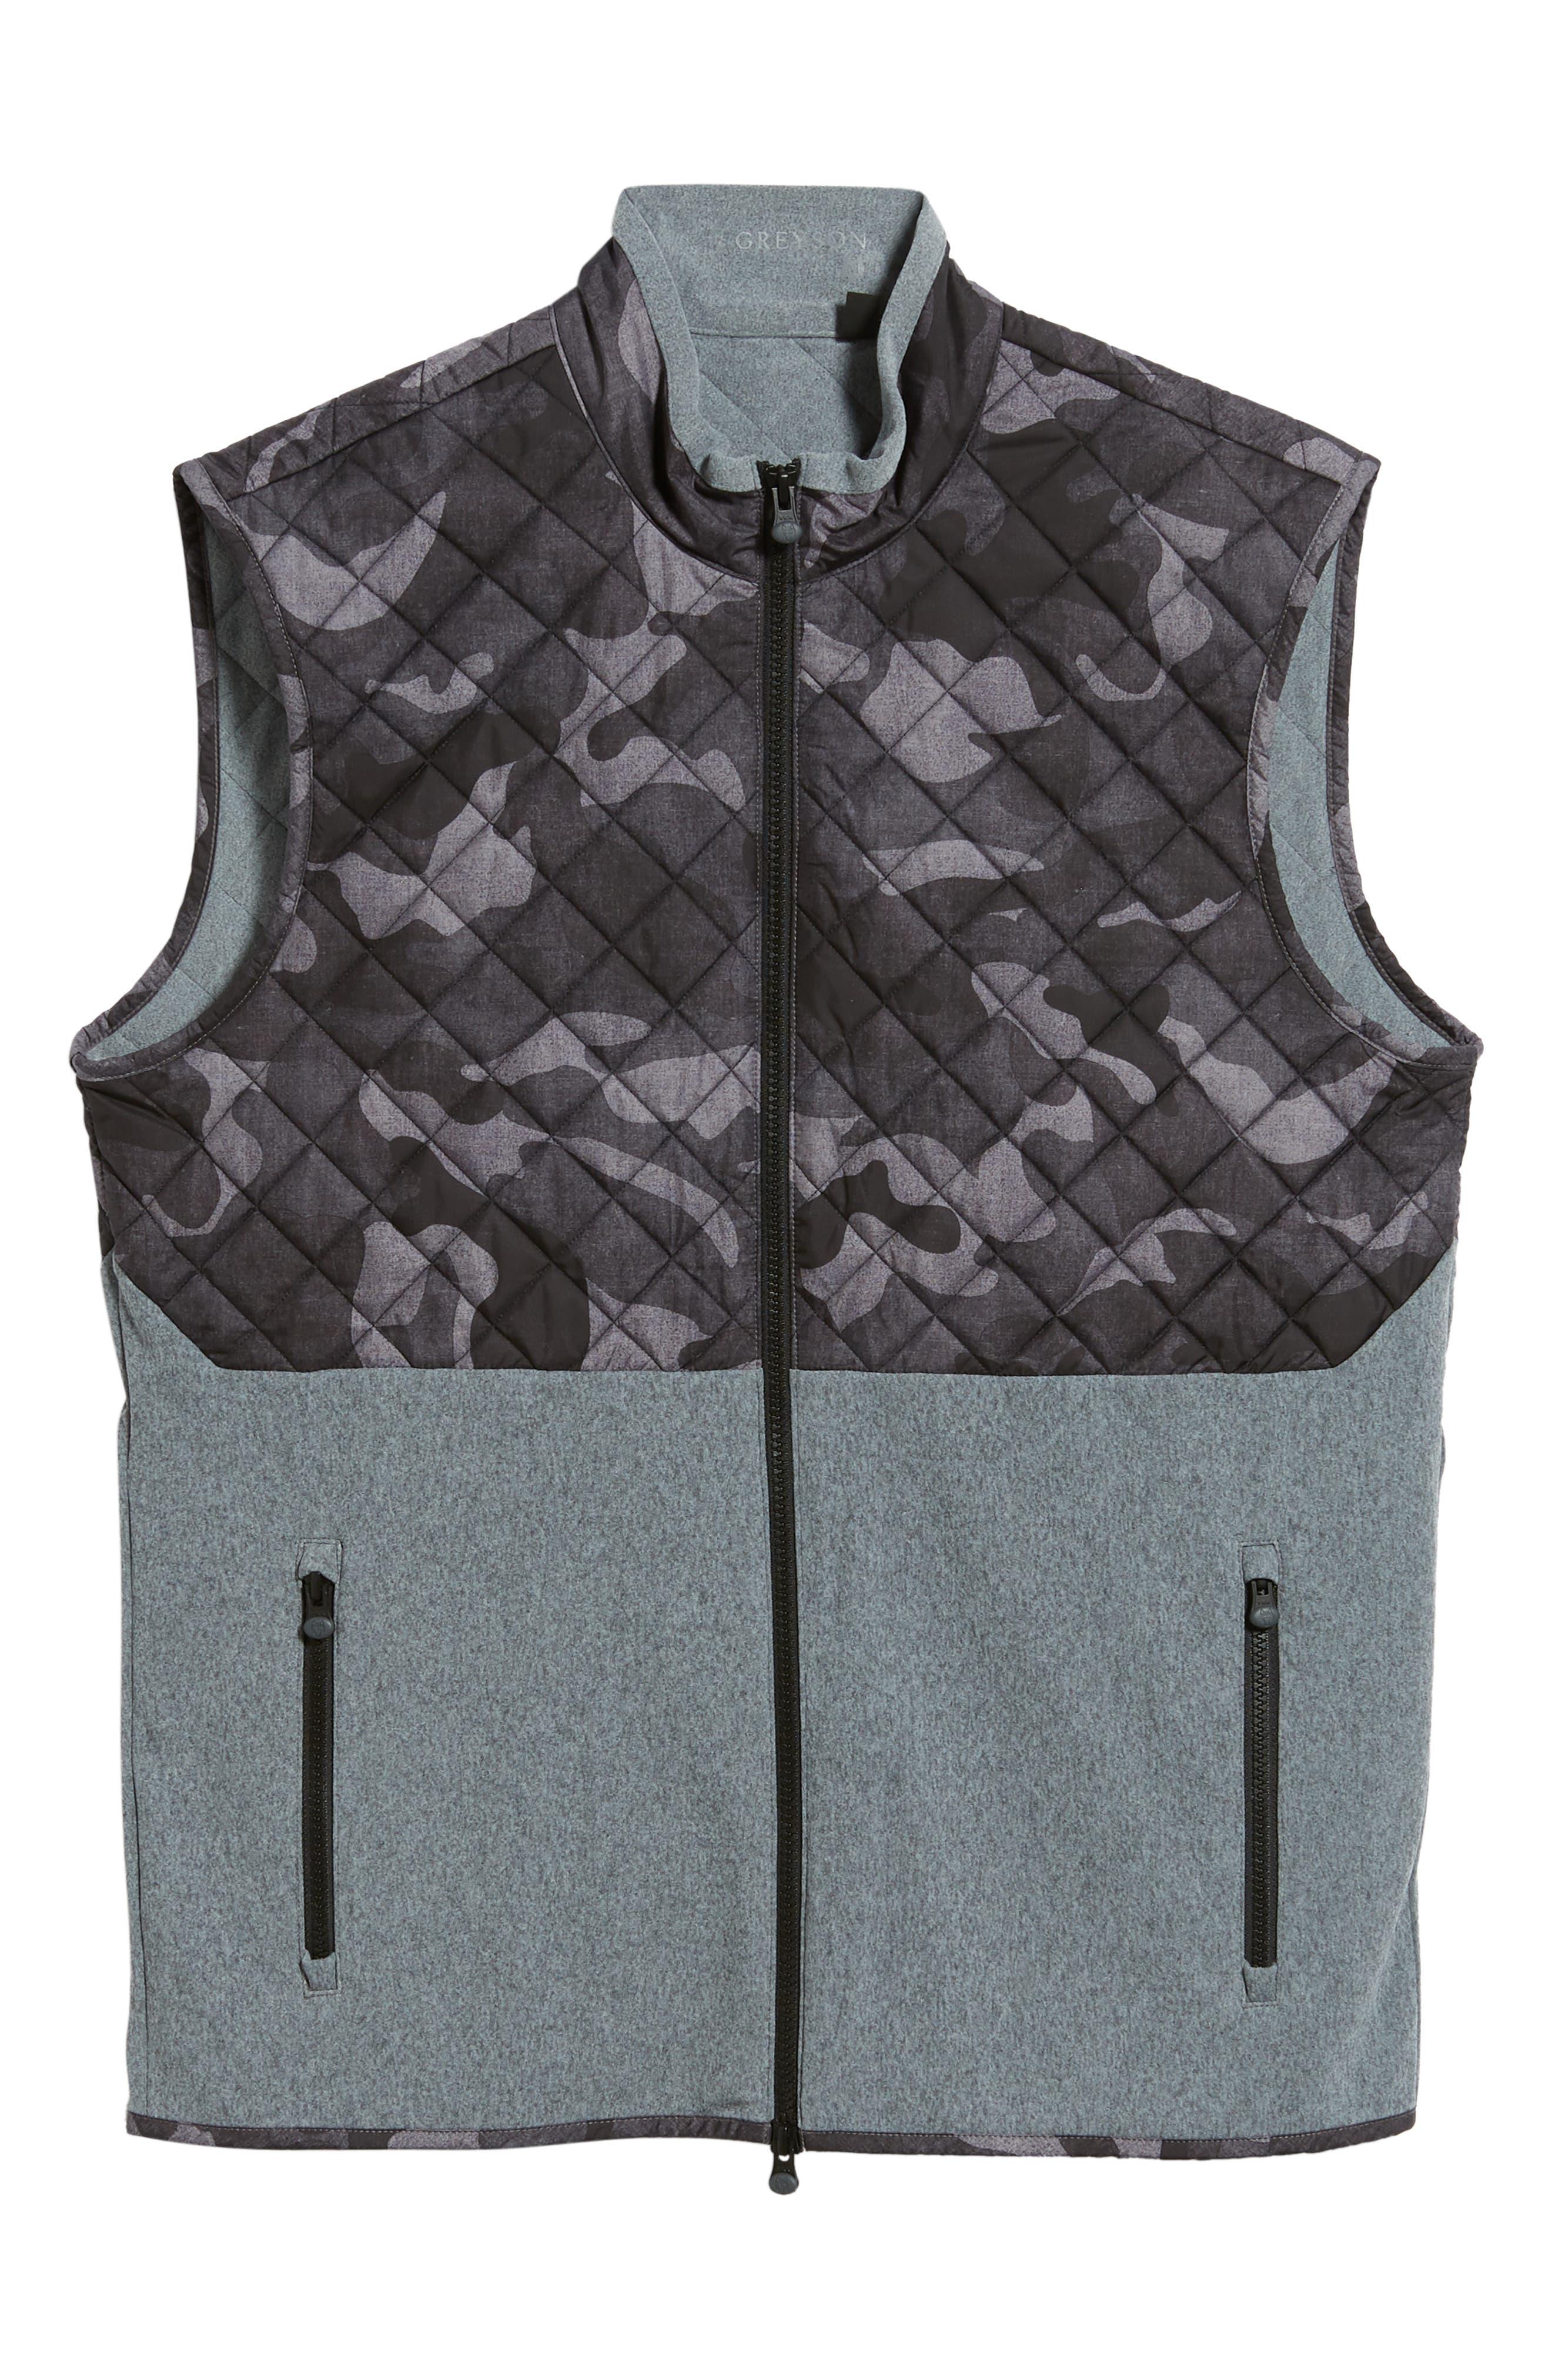 Huron Hybrid Vest,                             Alternate thumbnail 6, color,                             GREY HEATHER/ GREY CAMO